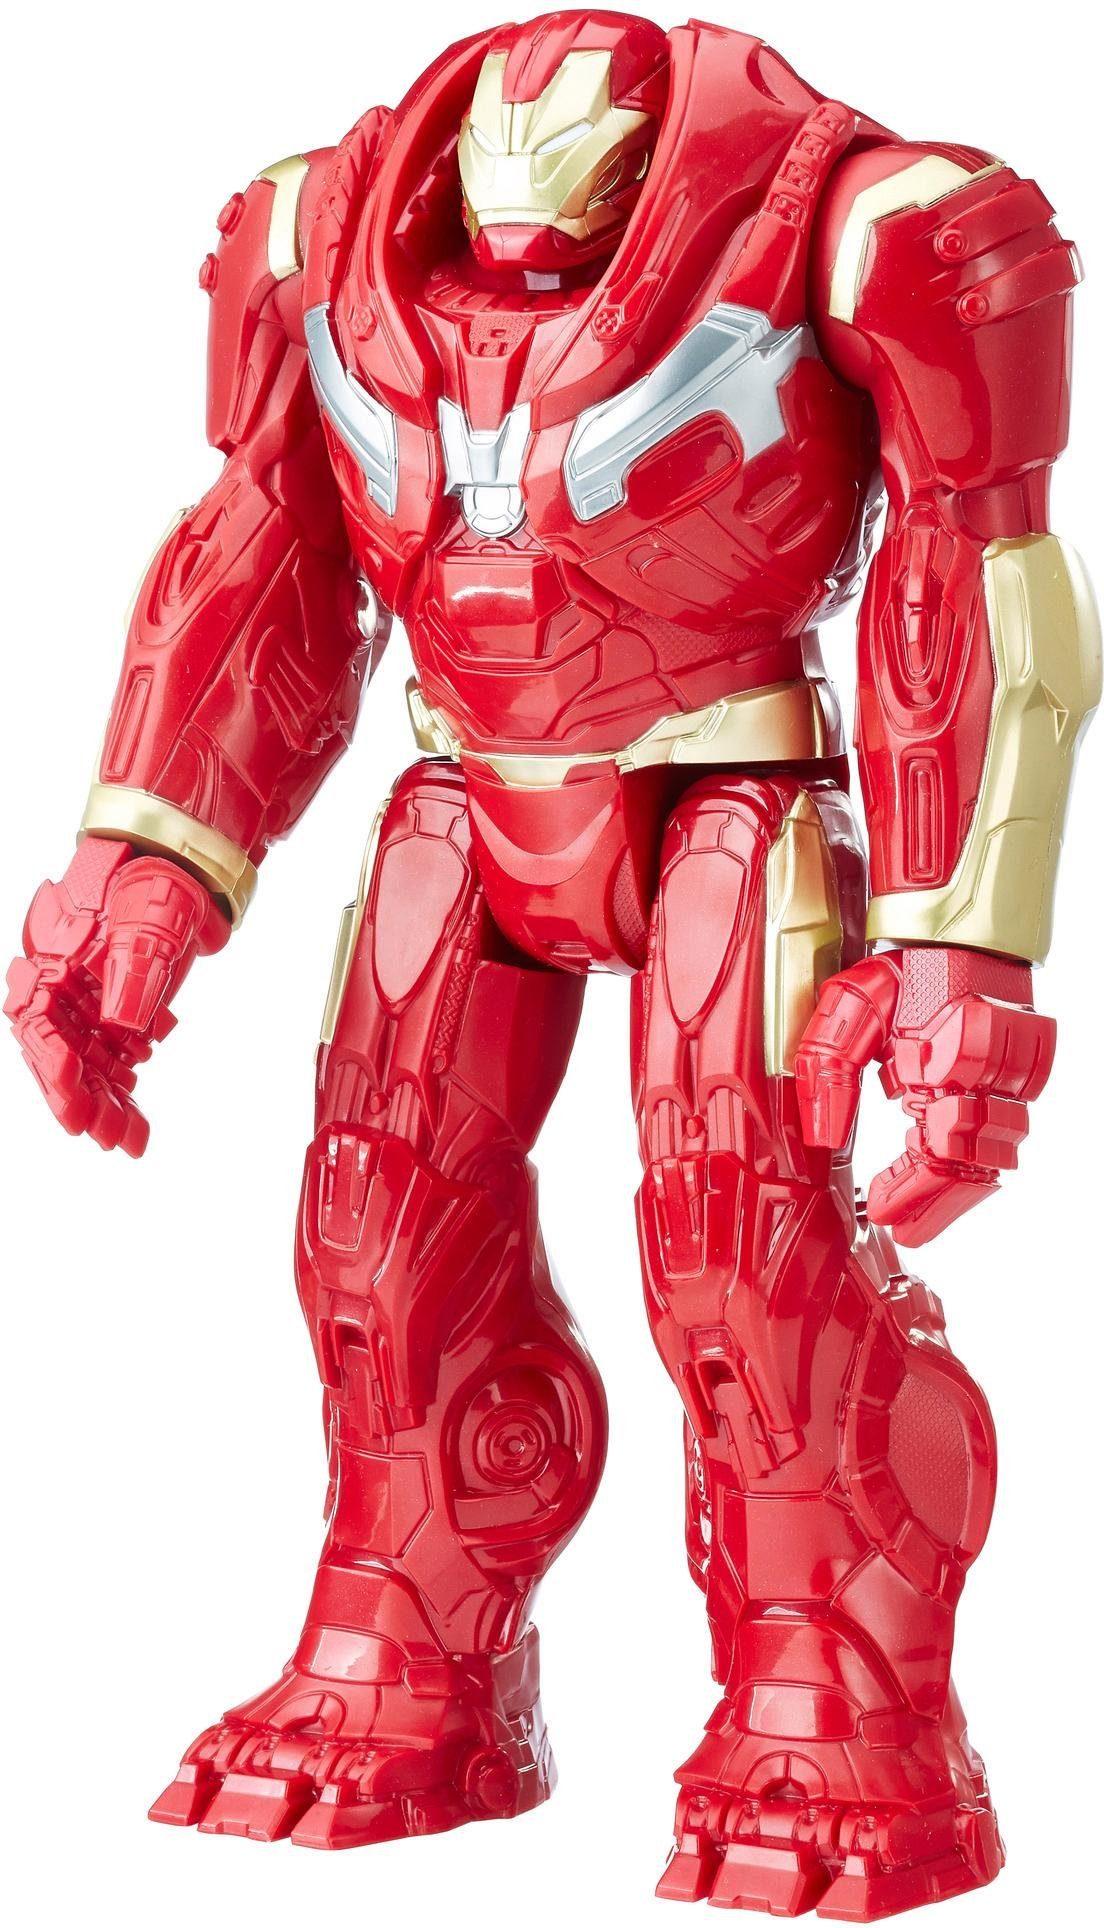 Hasbro Spielfigur, »Marvel Avengers Titan Hero Power FX, Hulk Buster«